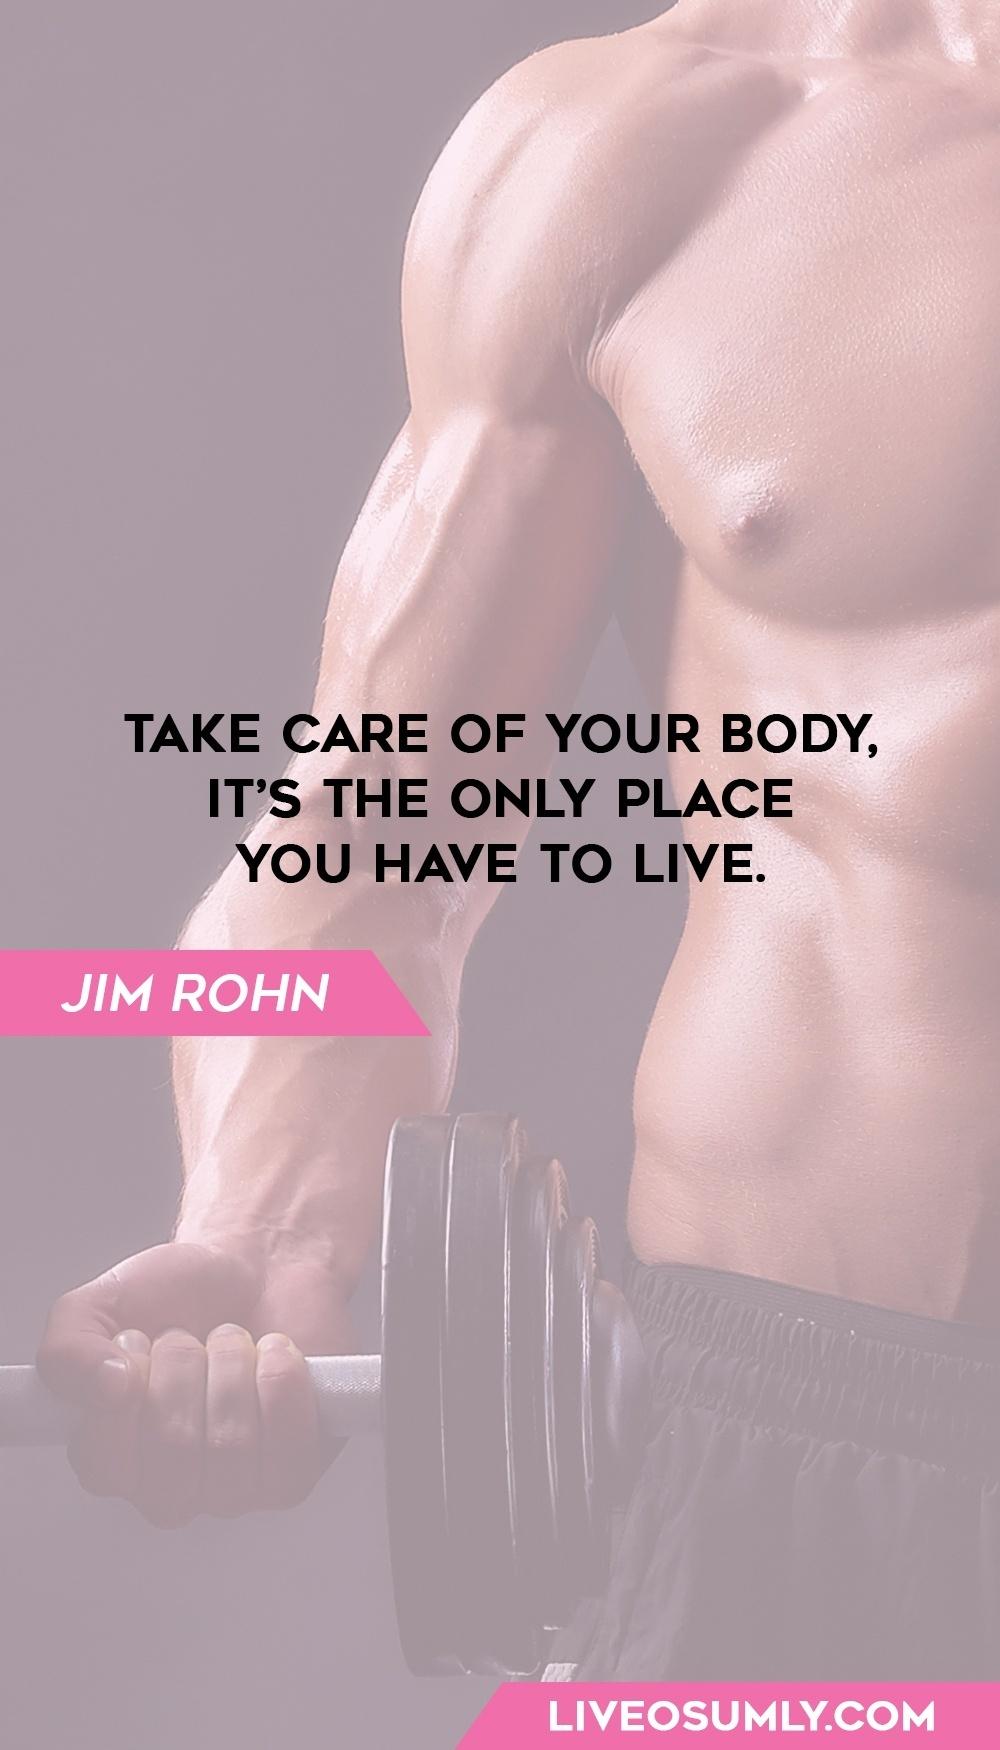 39. Jim Rohn Motivational Fitness Quotes